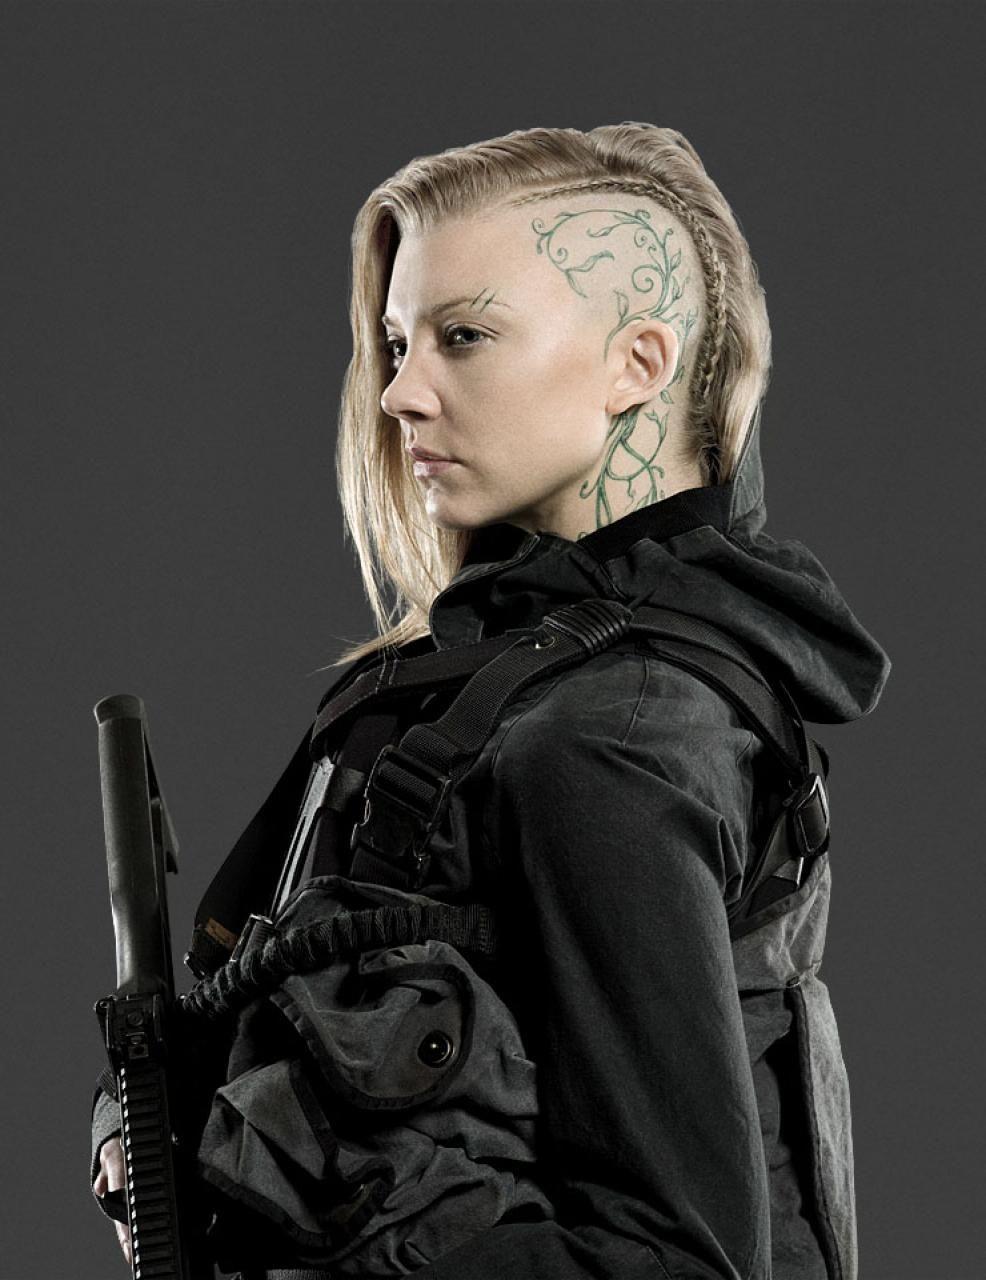 Natalie Dormer The Hunger Games - Google Search | Hunger